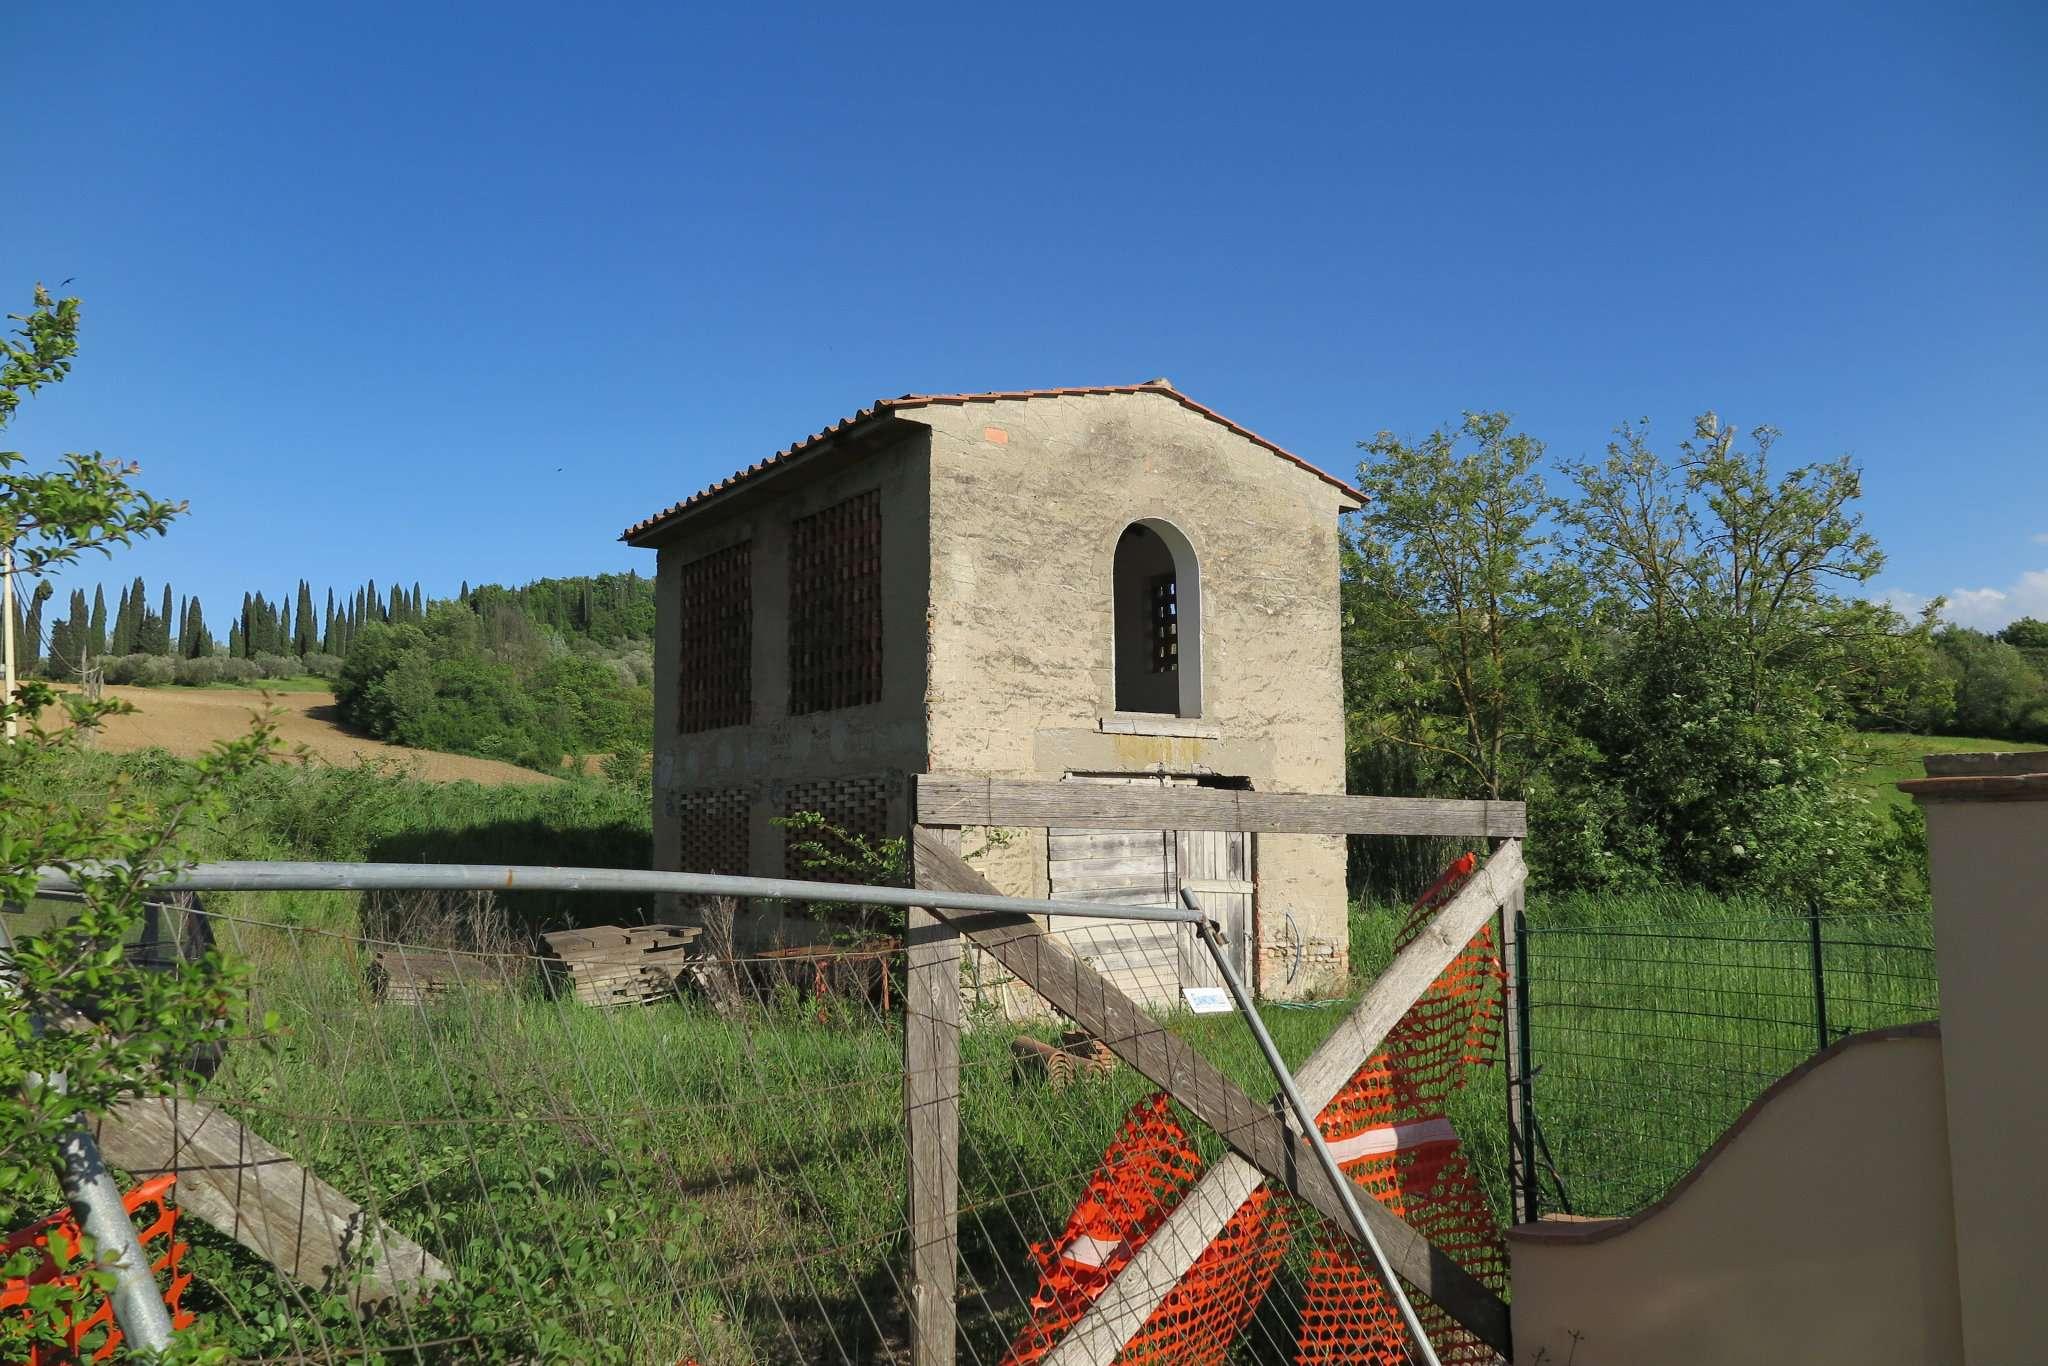 Bilocale San Casciano in Val di Pesa Via Empolese 7